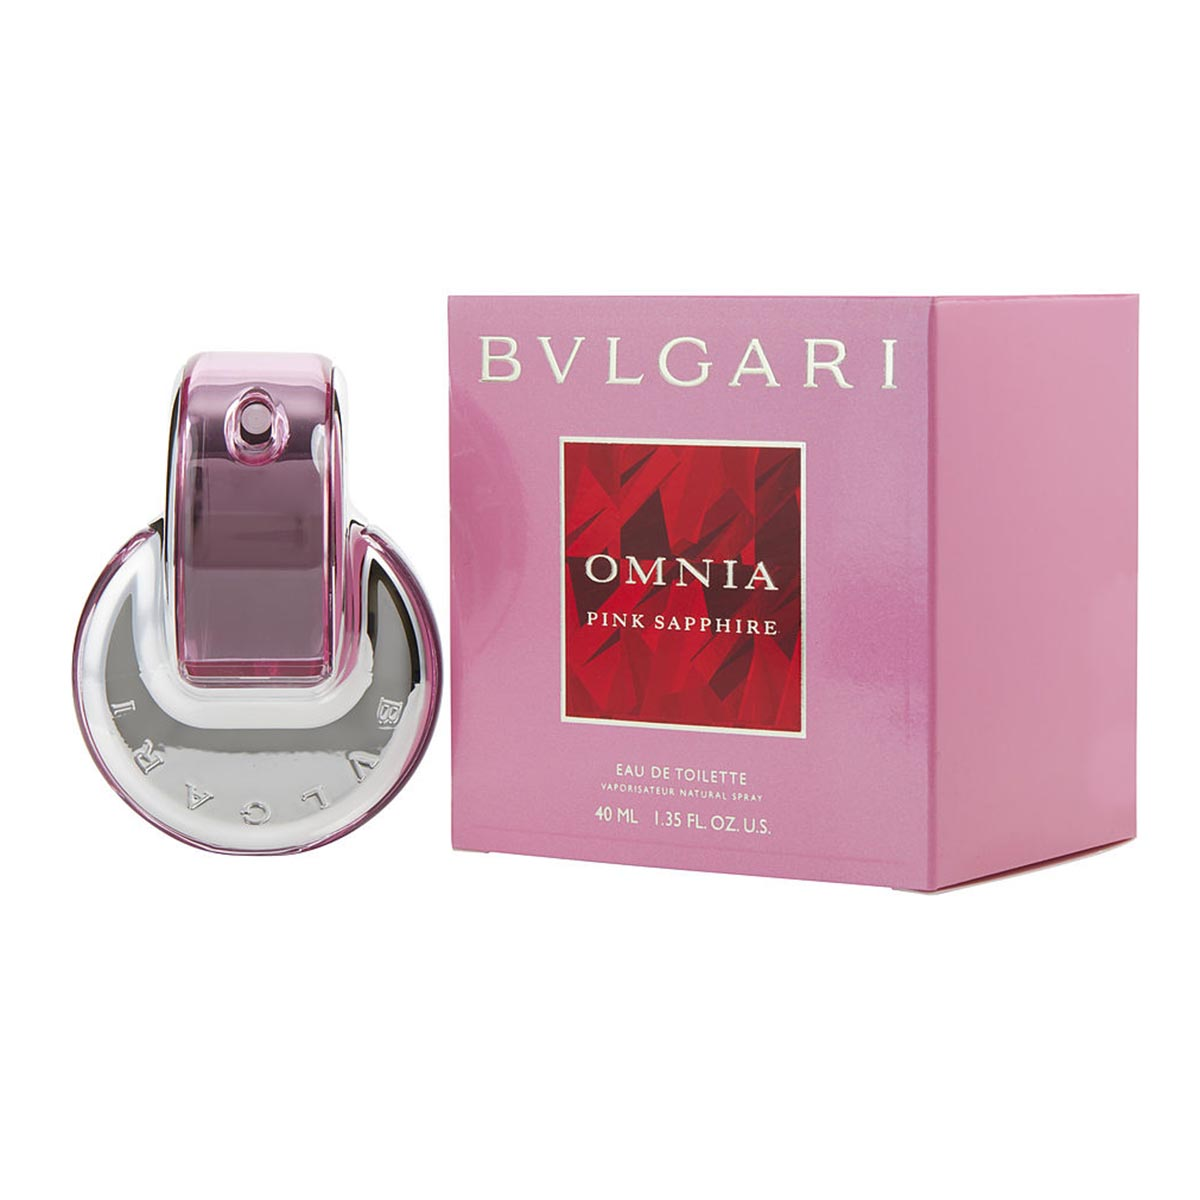 Bvlgari omnia pink sapphite eau de toilette 40ml vaporizador